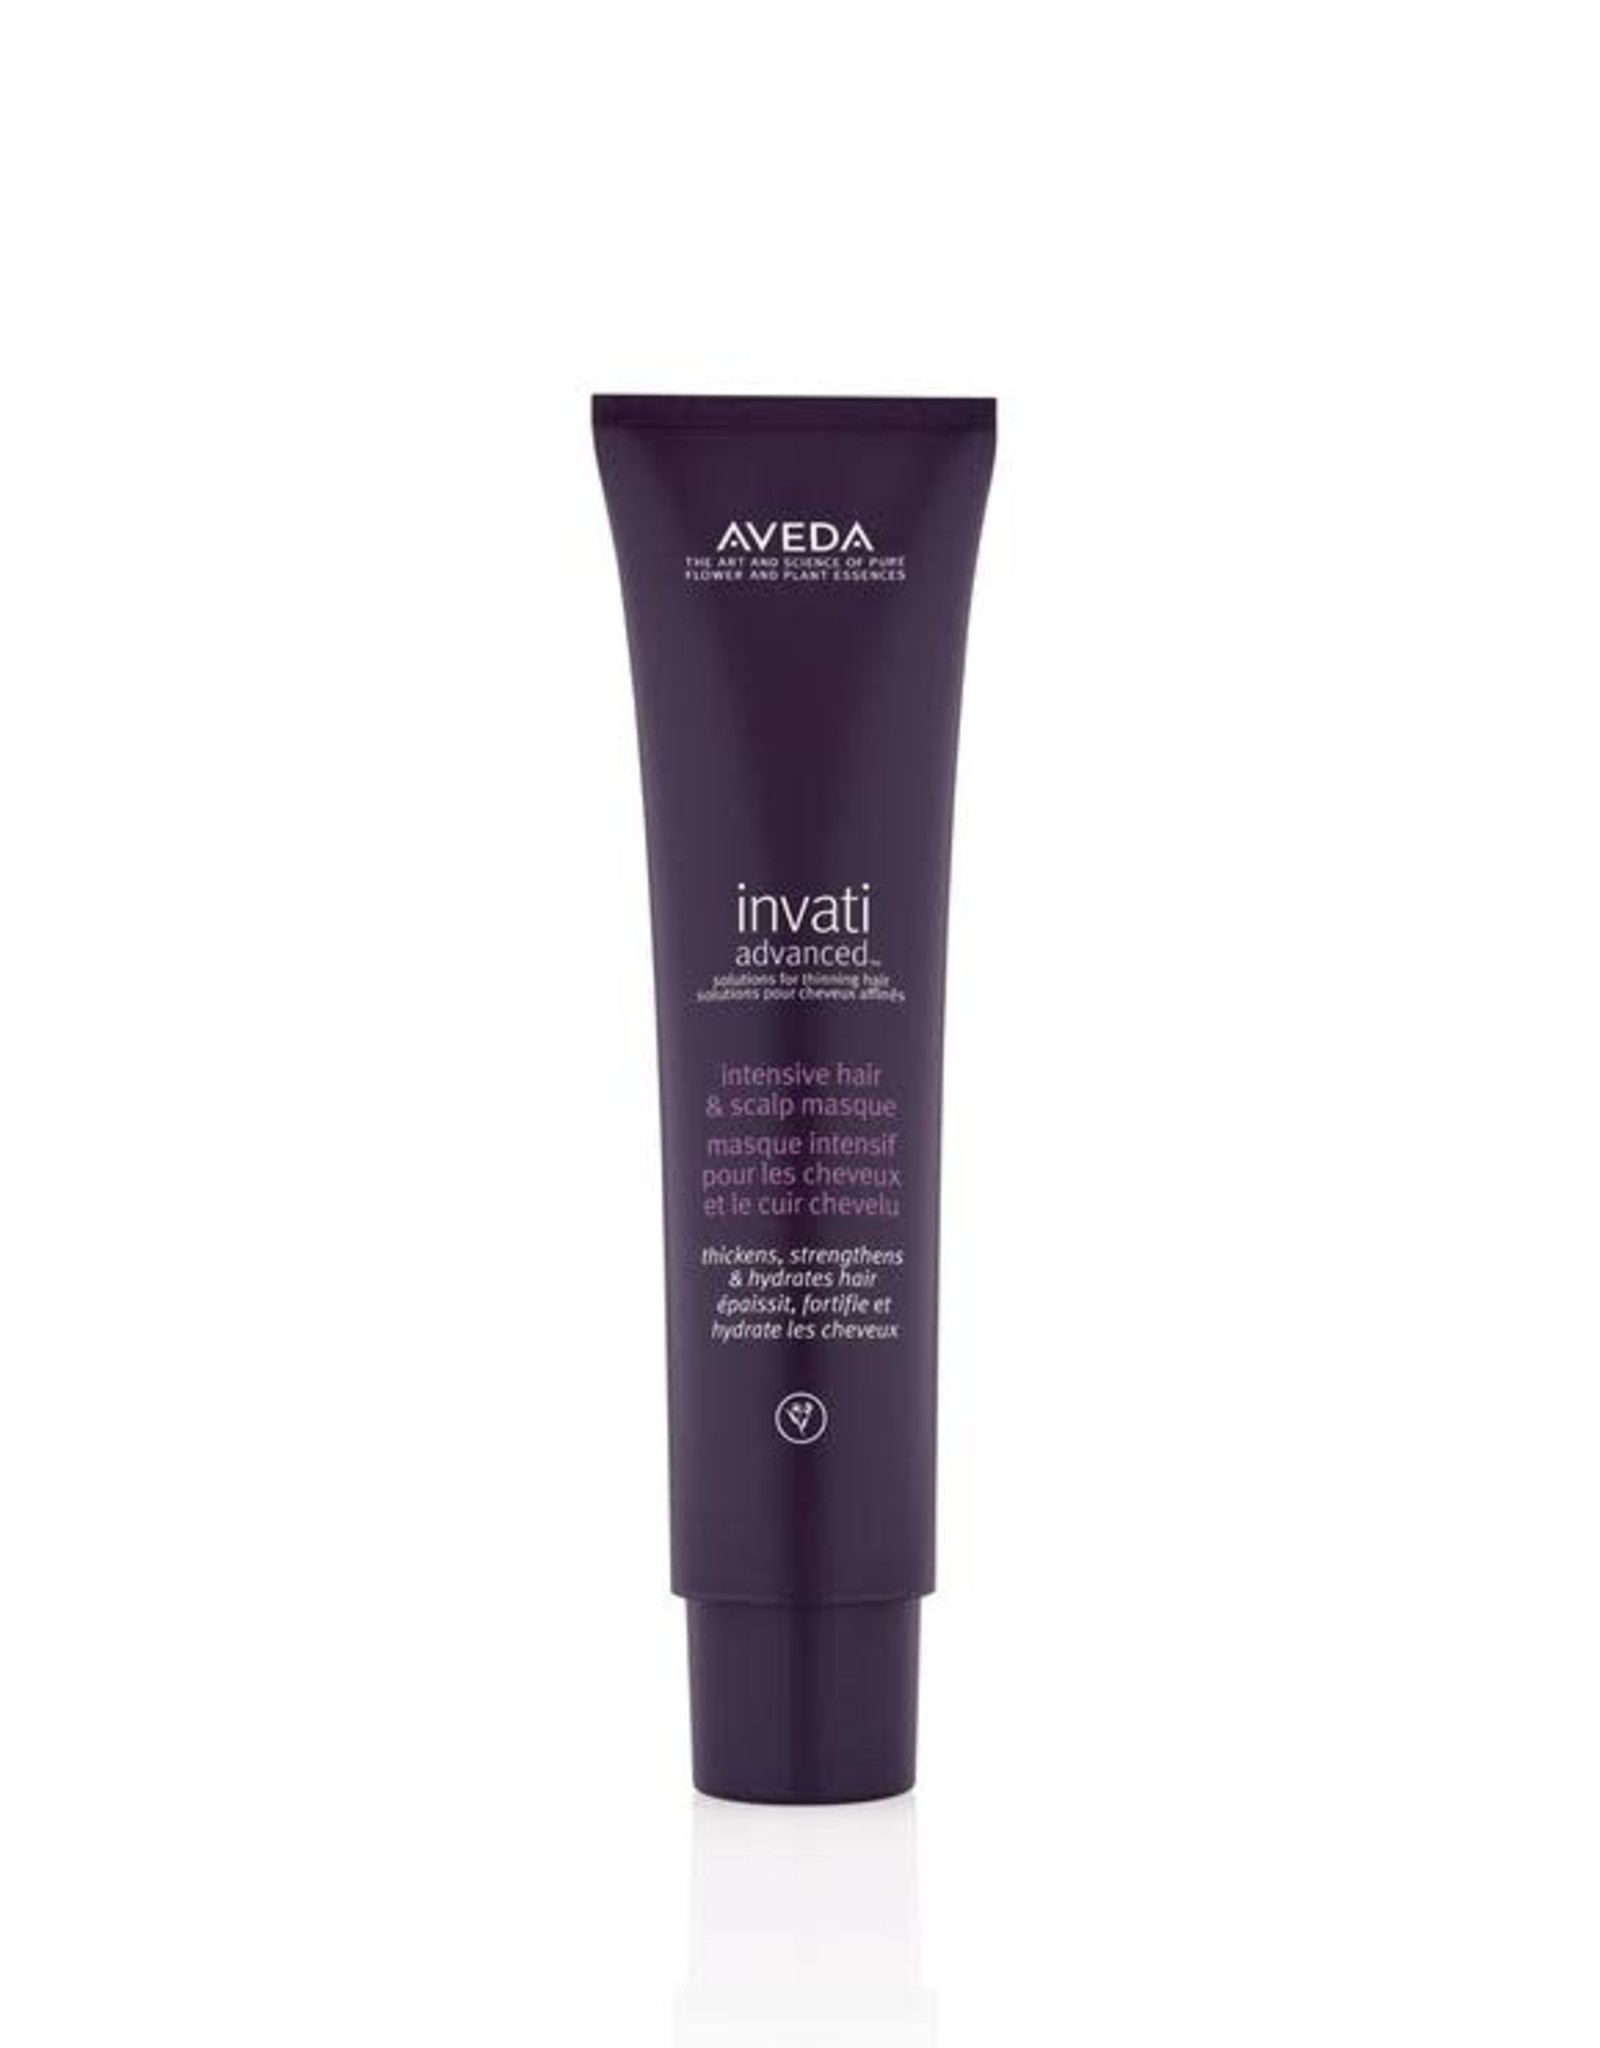 AVEDA Invati Advanced™ Intensive Hair and Scalp Masque